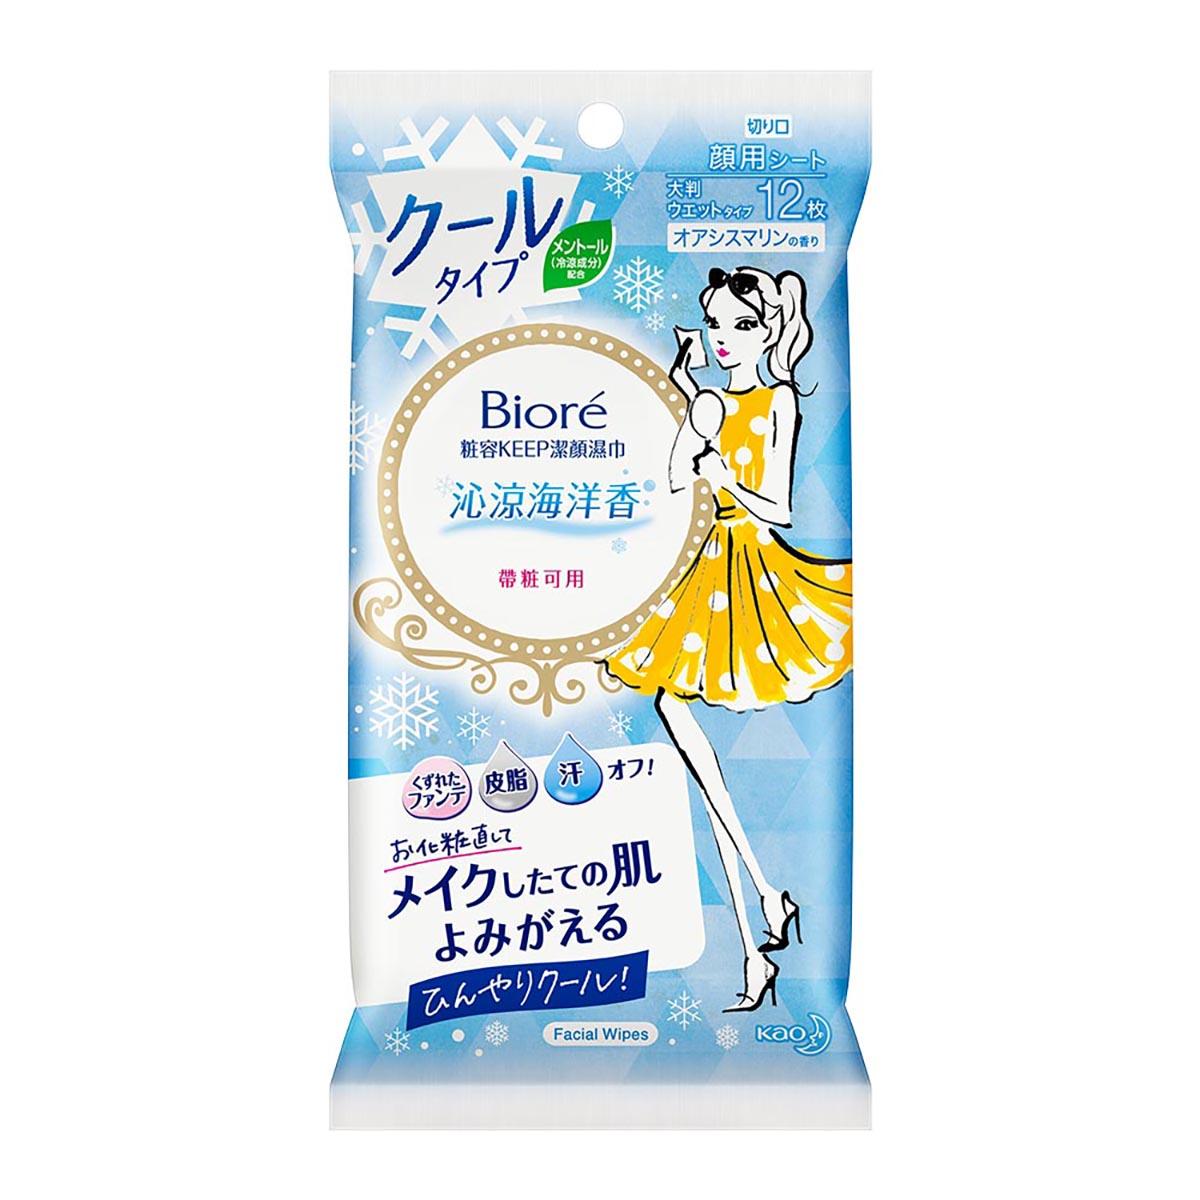 Biore蜜妮 粧容KEEP潔顏濕巾沁涼海洋香12片 【康是美】